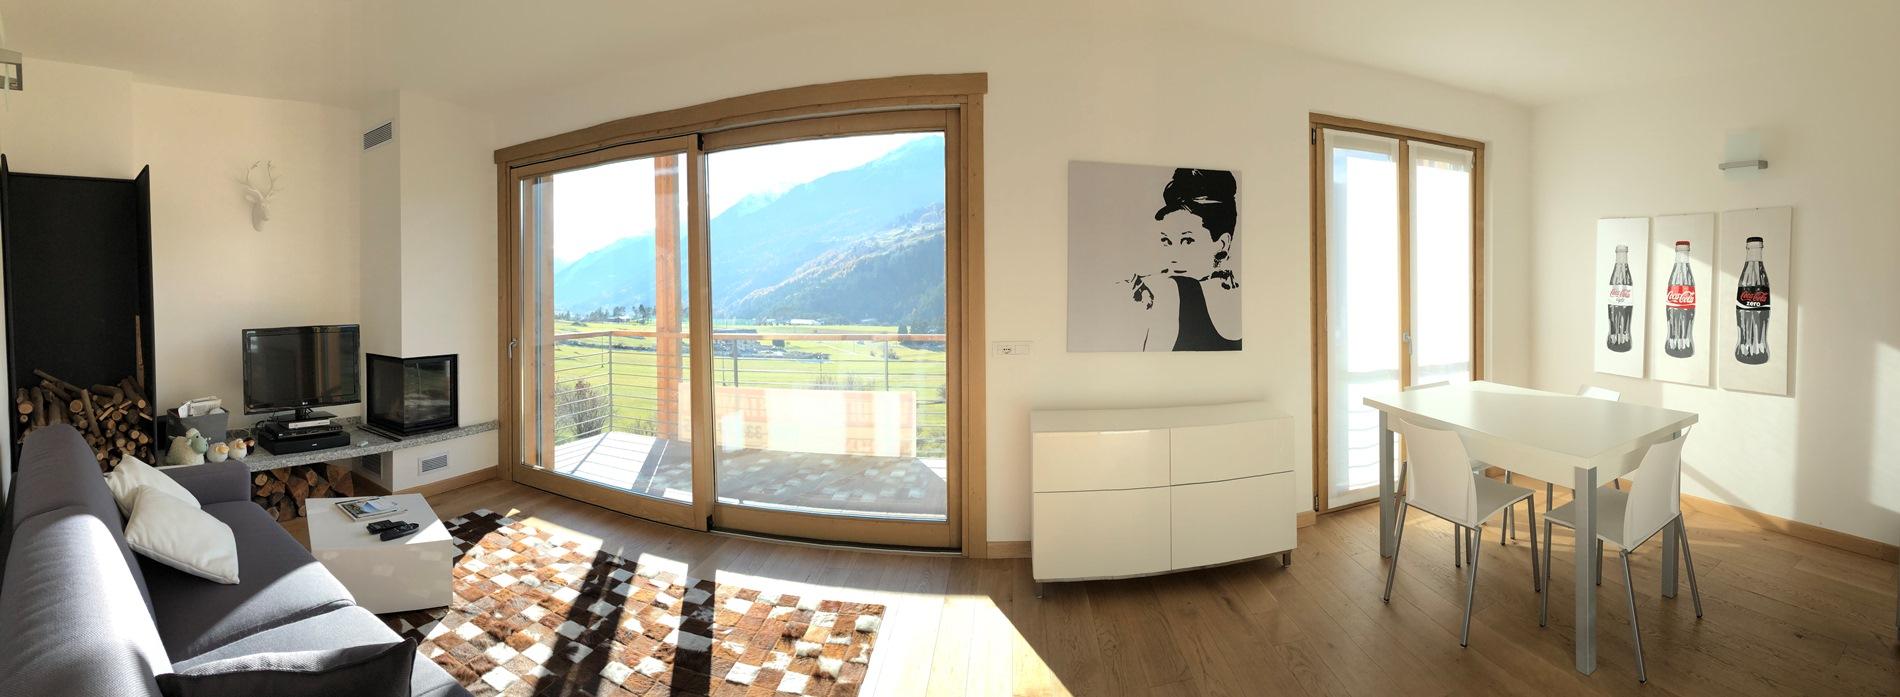 Appartamento moderno a basso consumo energetico